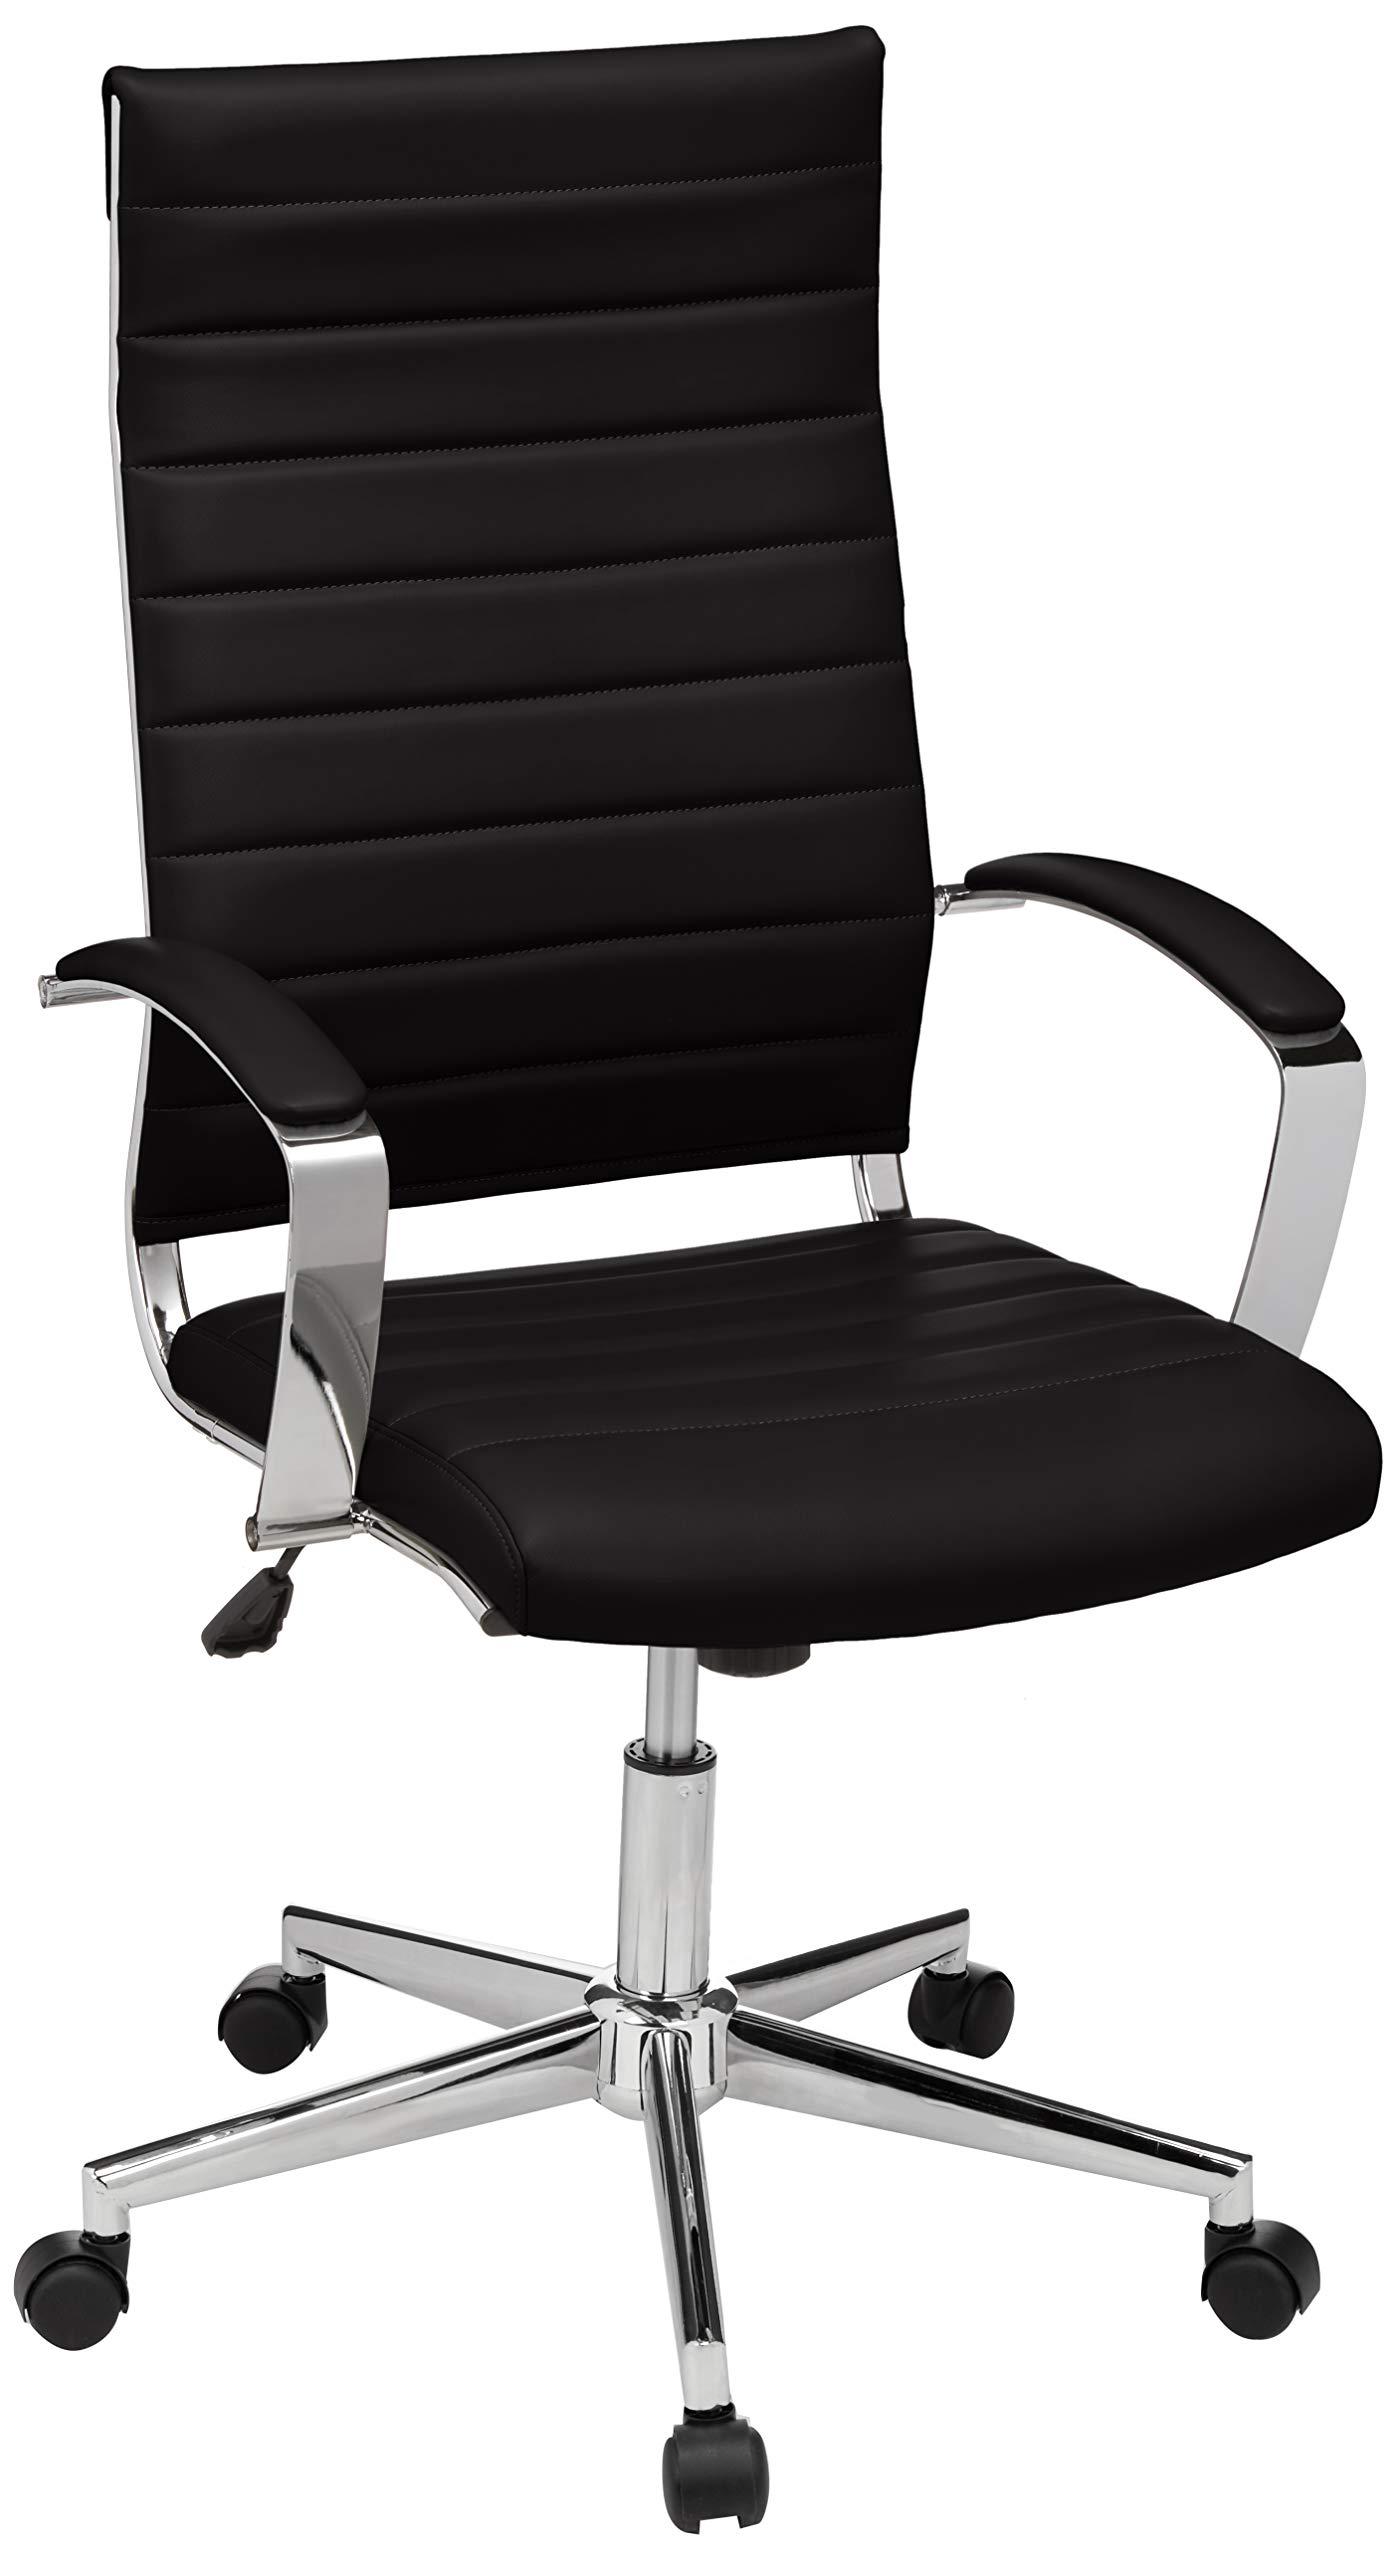 AmazonBasics High-Back Executive Swivel Office Desk Chair with Ribbed Puresoft Upholstery - Black by AmazonBasics